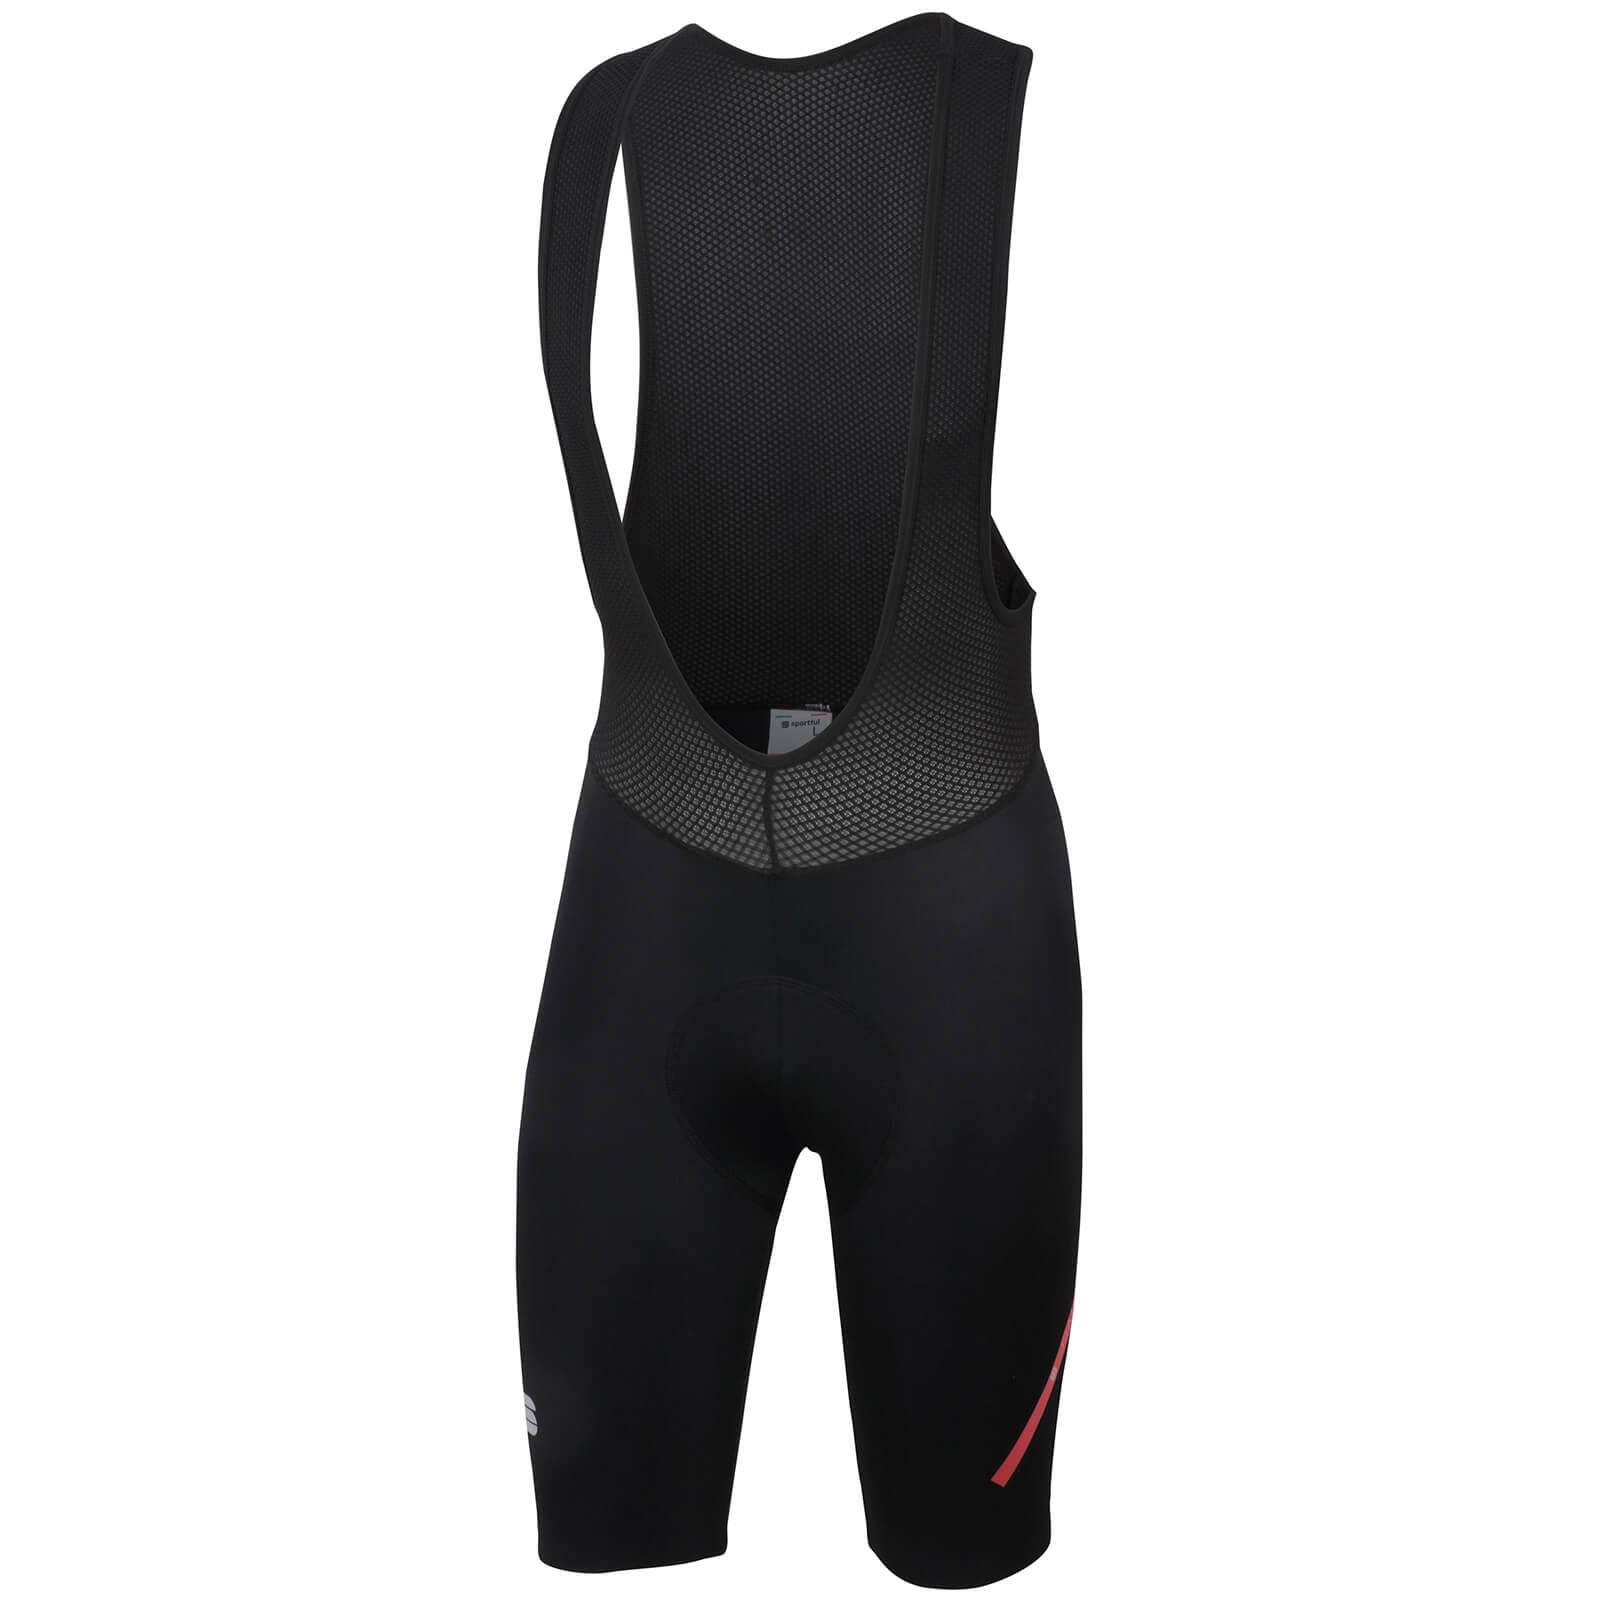 Sportful Fiandre Light NoRain 2 Bib Shorts - Black - L